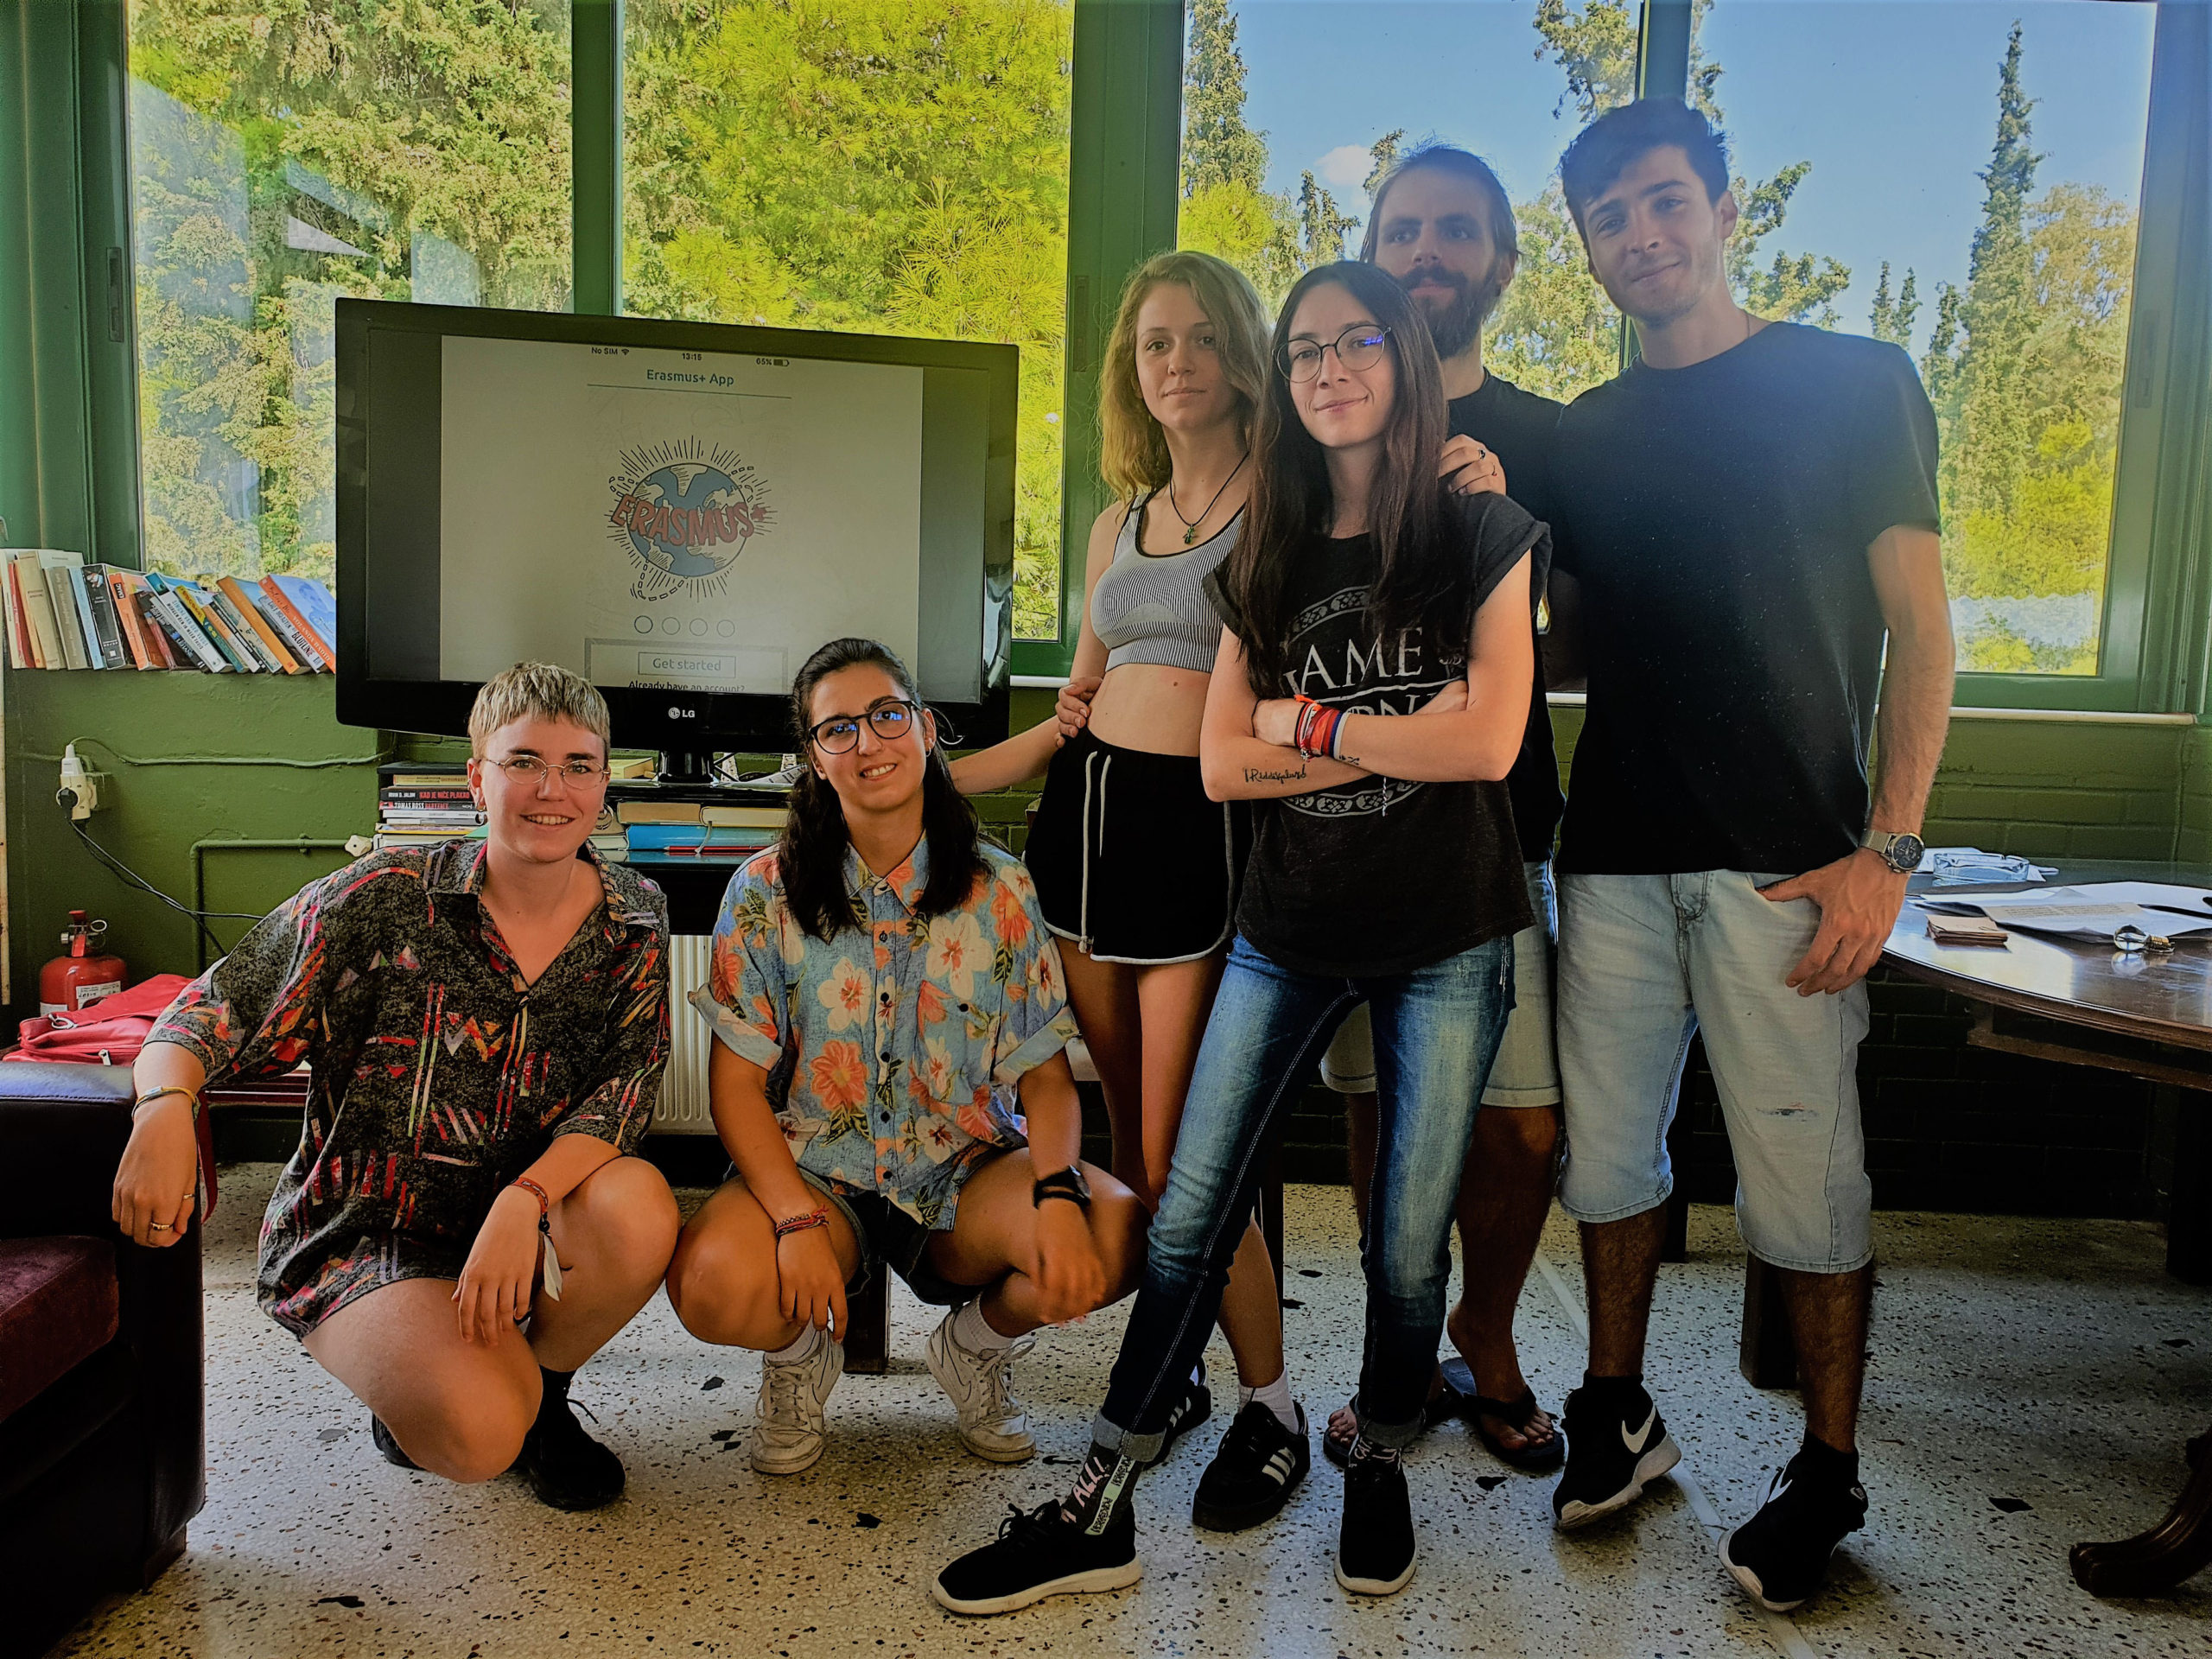 Presentation of the Erasmus + App by members of the Spanish team 2